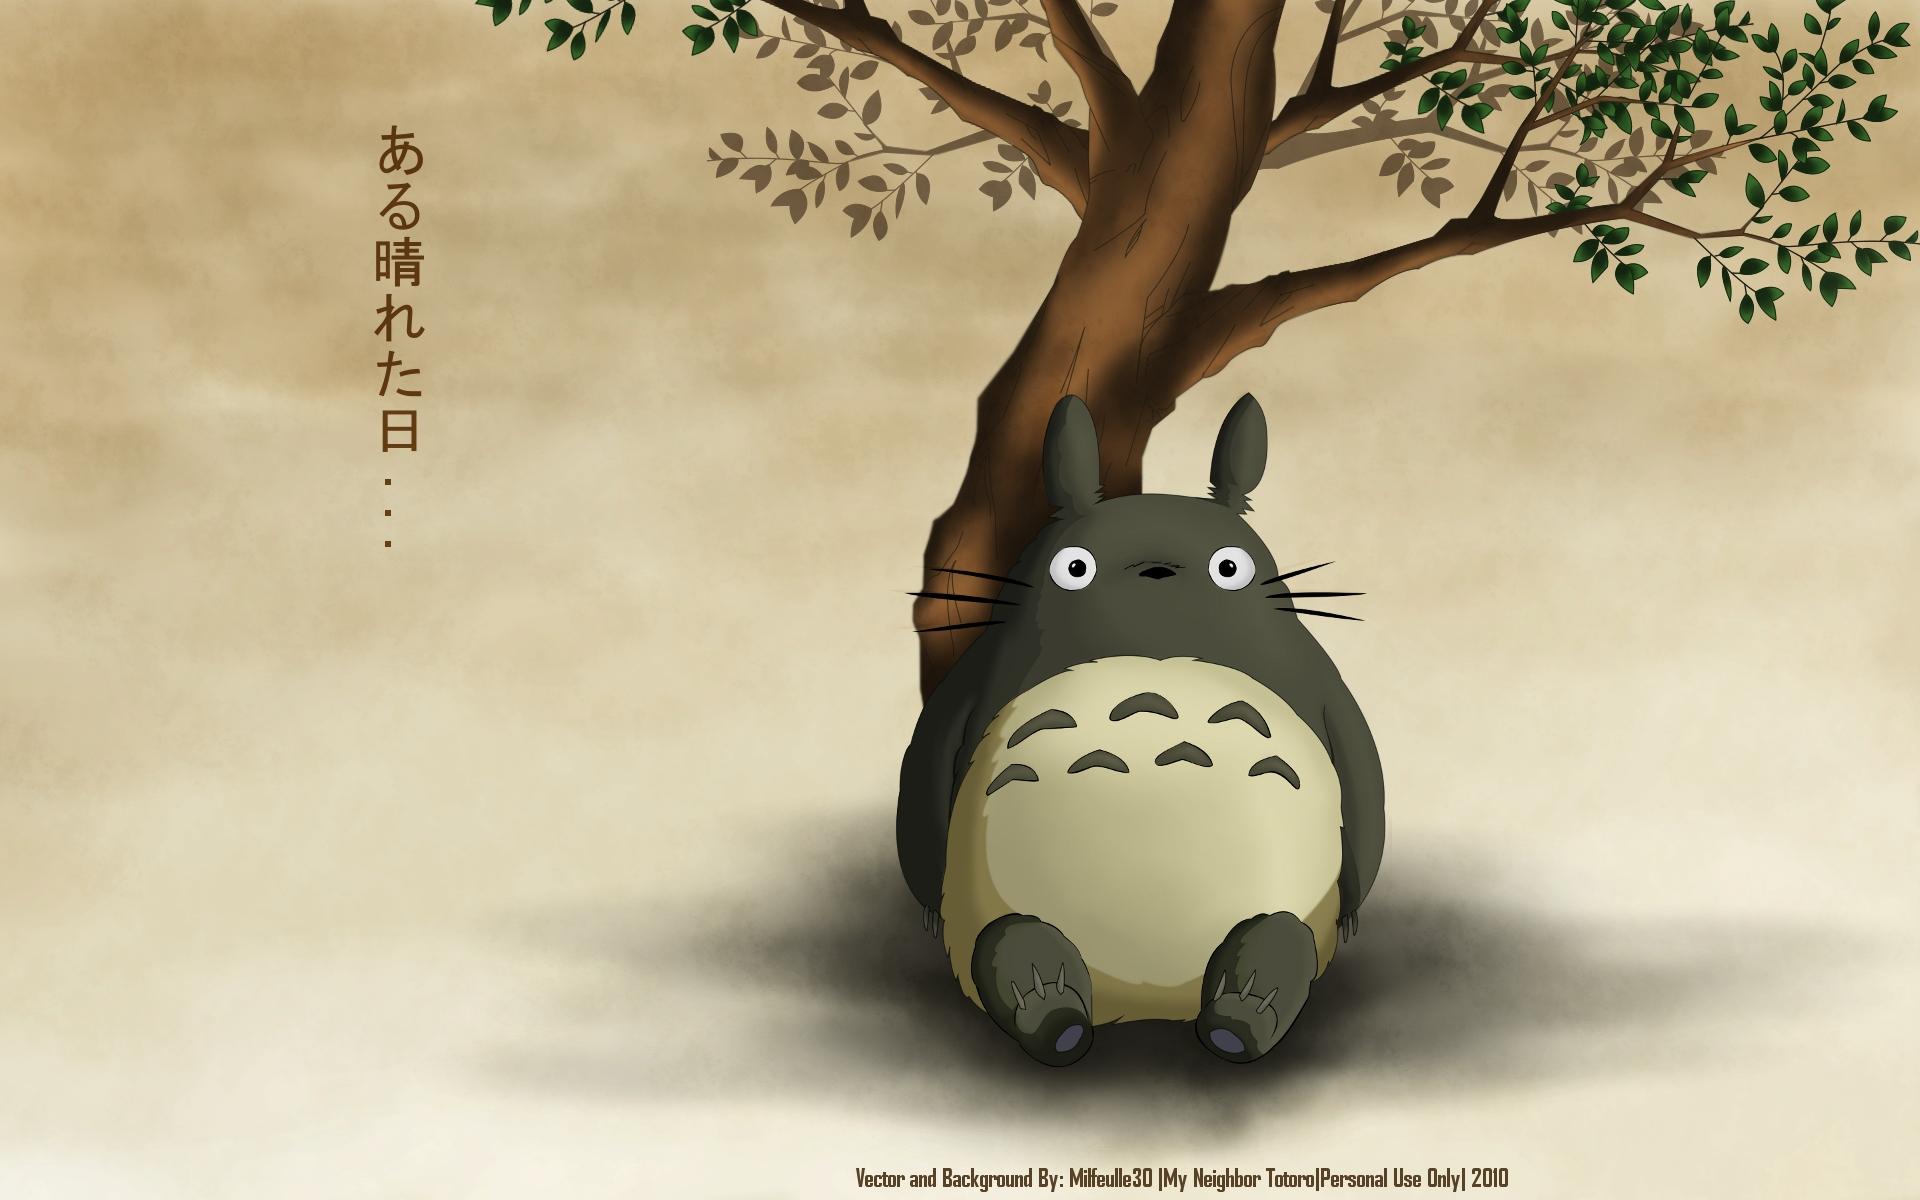 My Neighbor Totoro Wallpaper One Fine Day Minitokyo